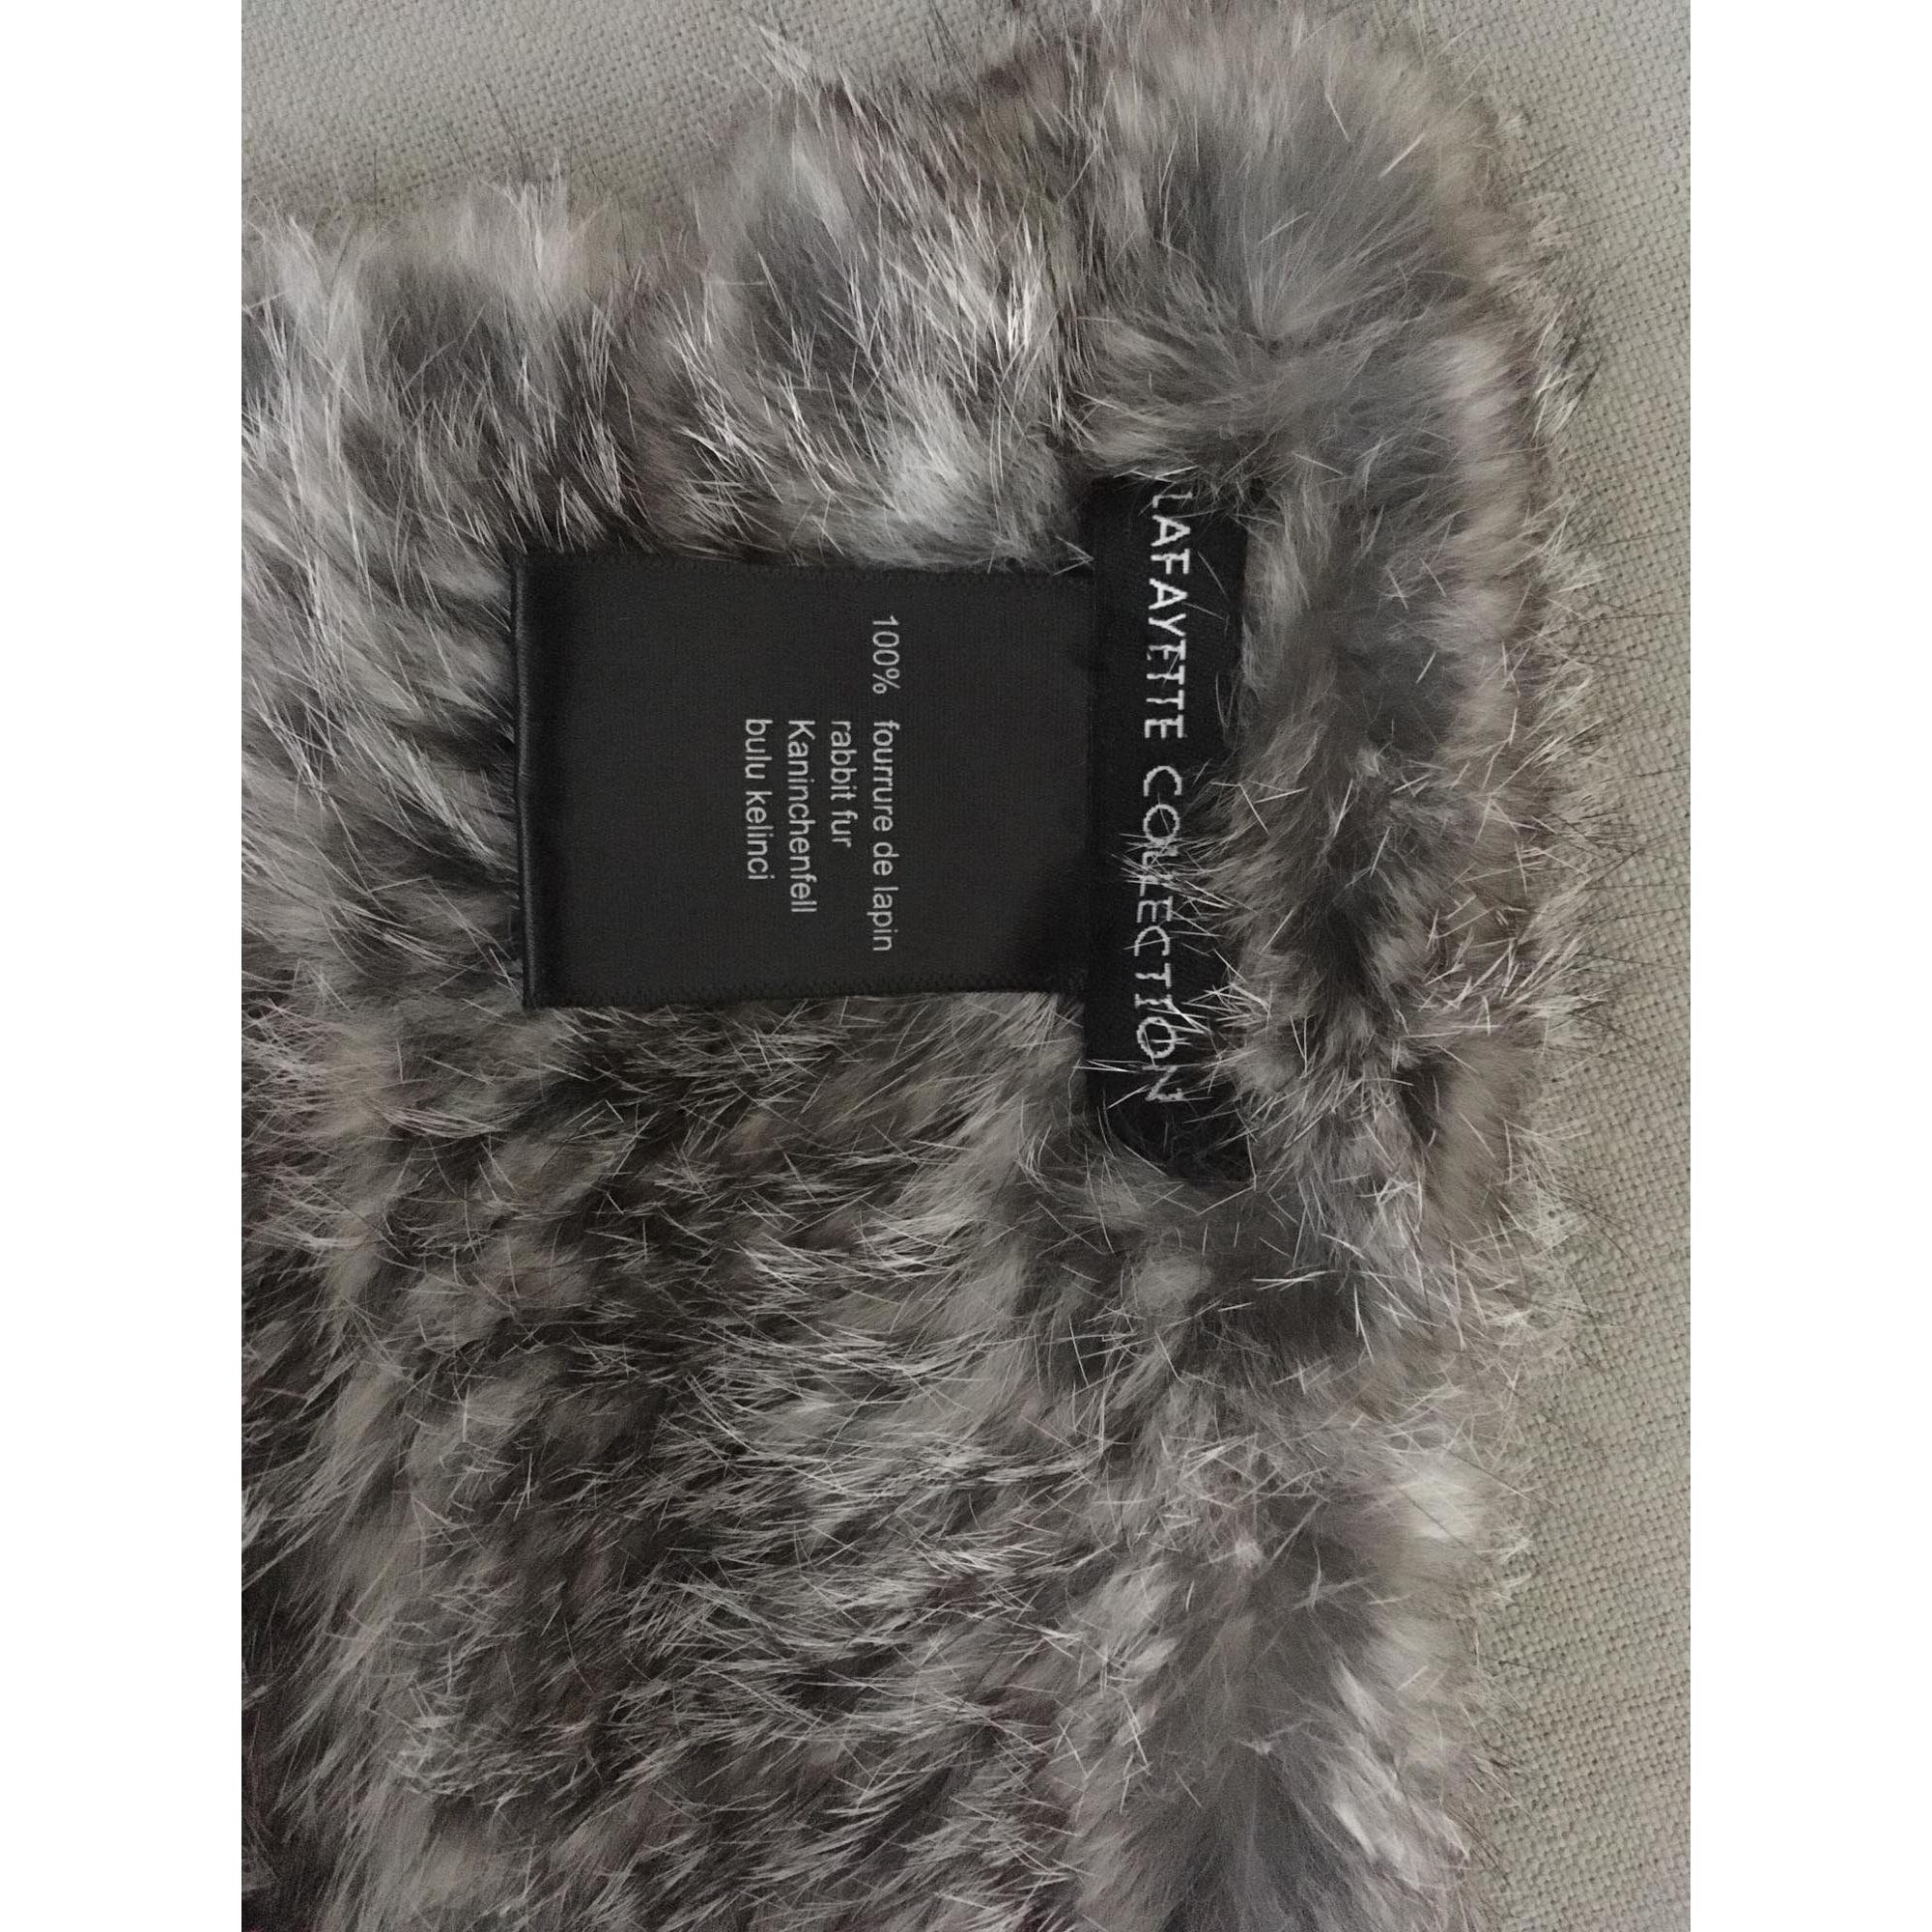 79ac456591b Echarpe GALERIES LAFAYETTE PARIS gris - 7160129